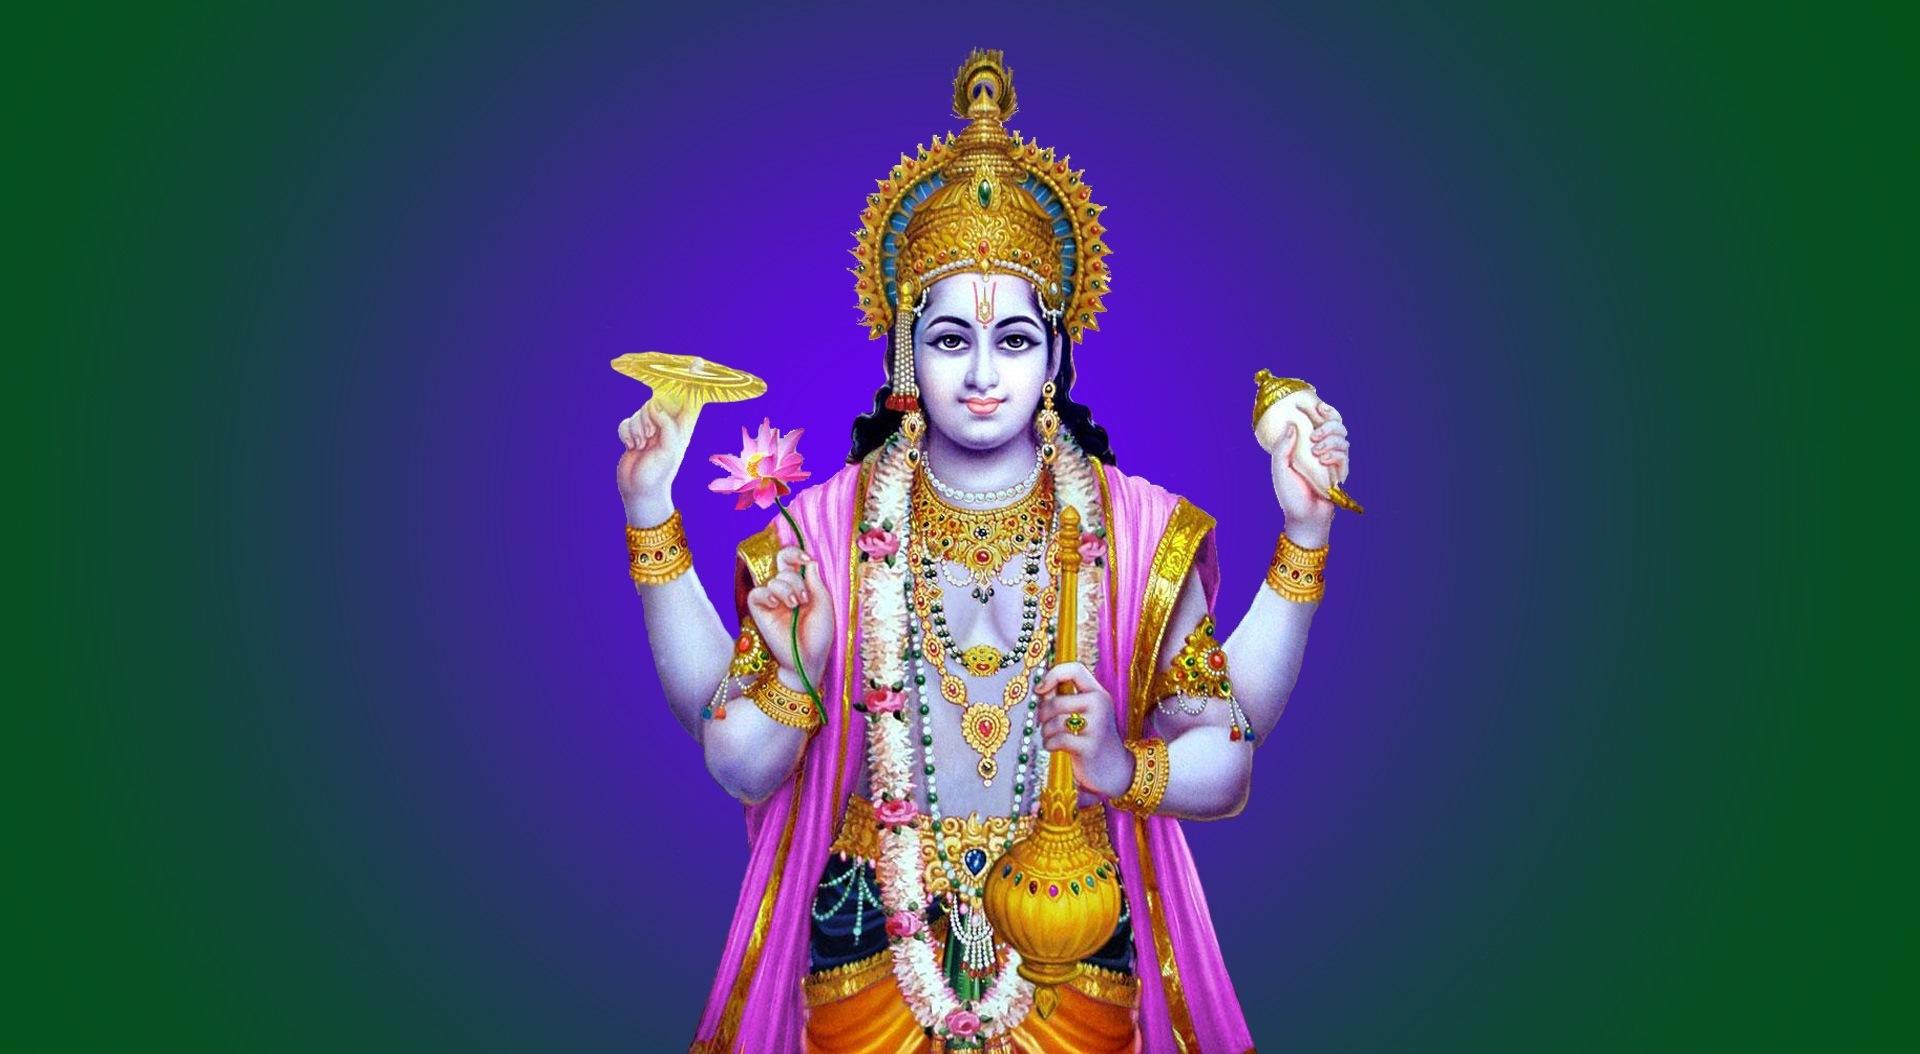 Lord Vishnu Images Wallpapers Photos Pics Download Lord Vishnu